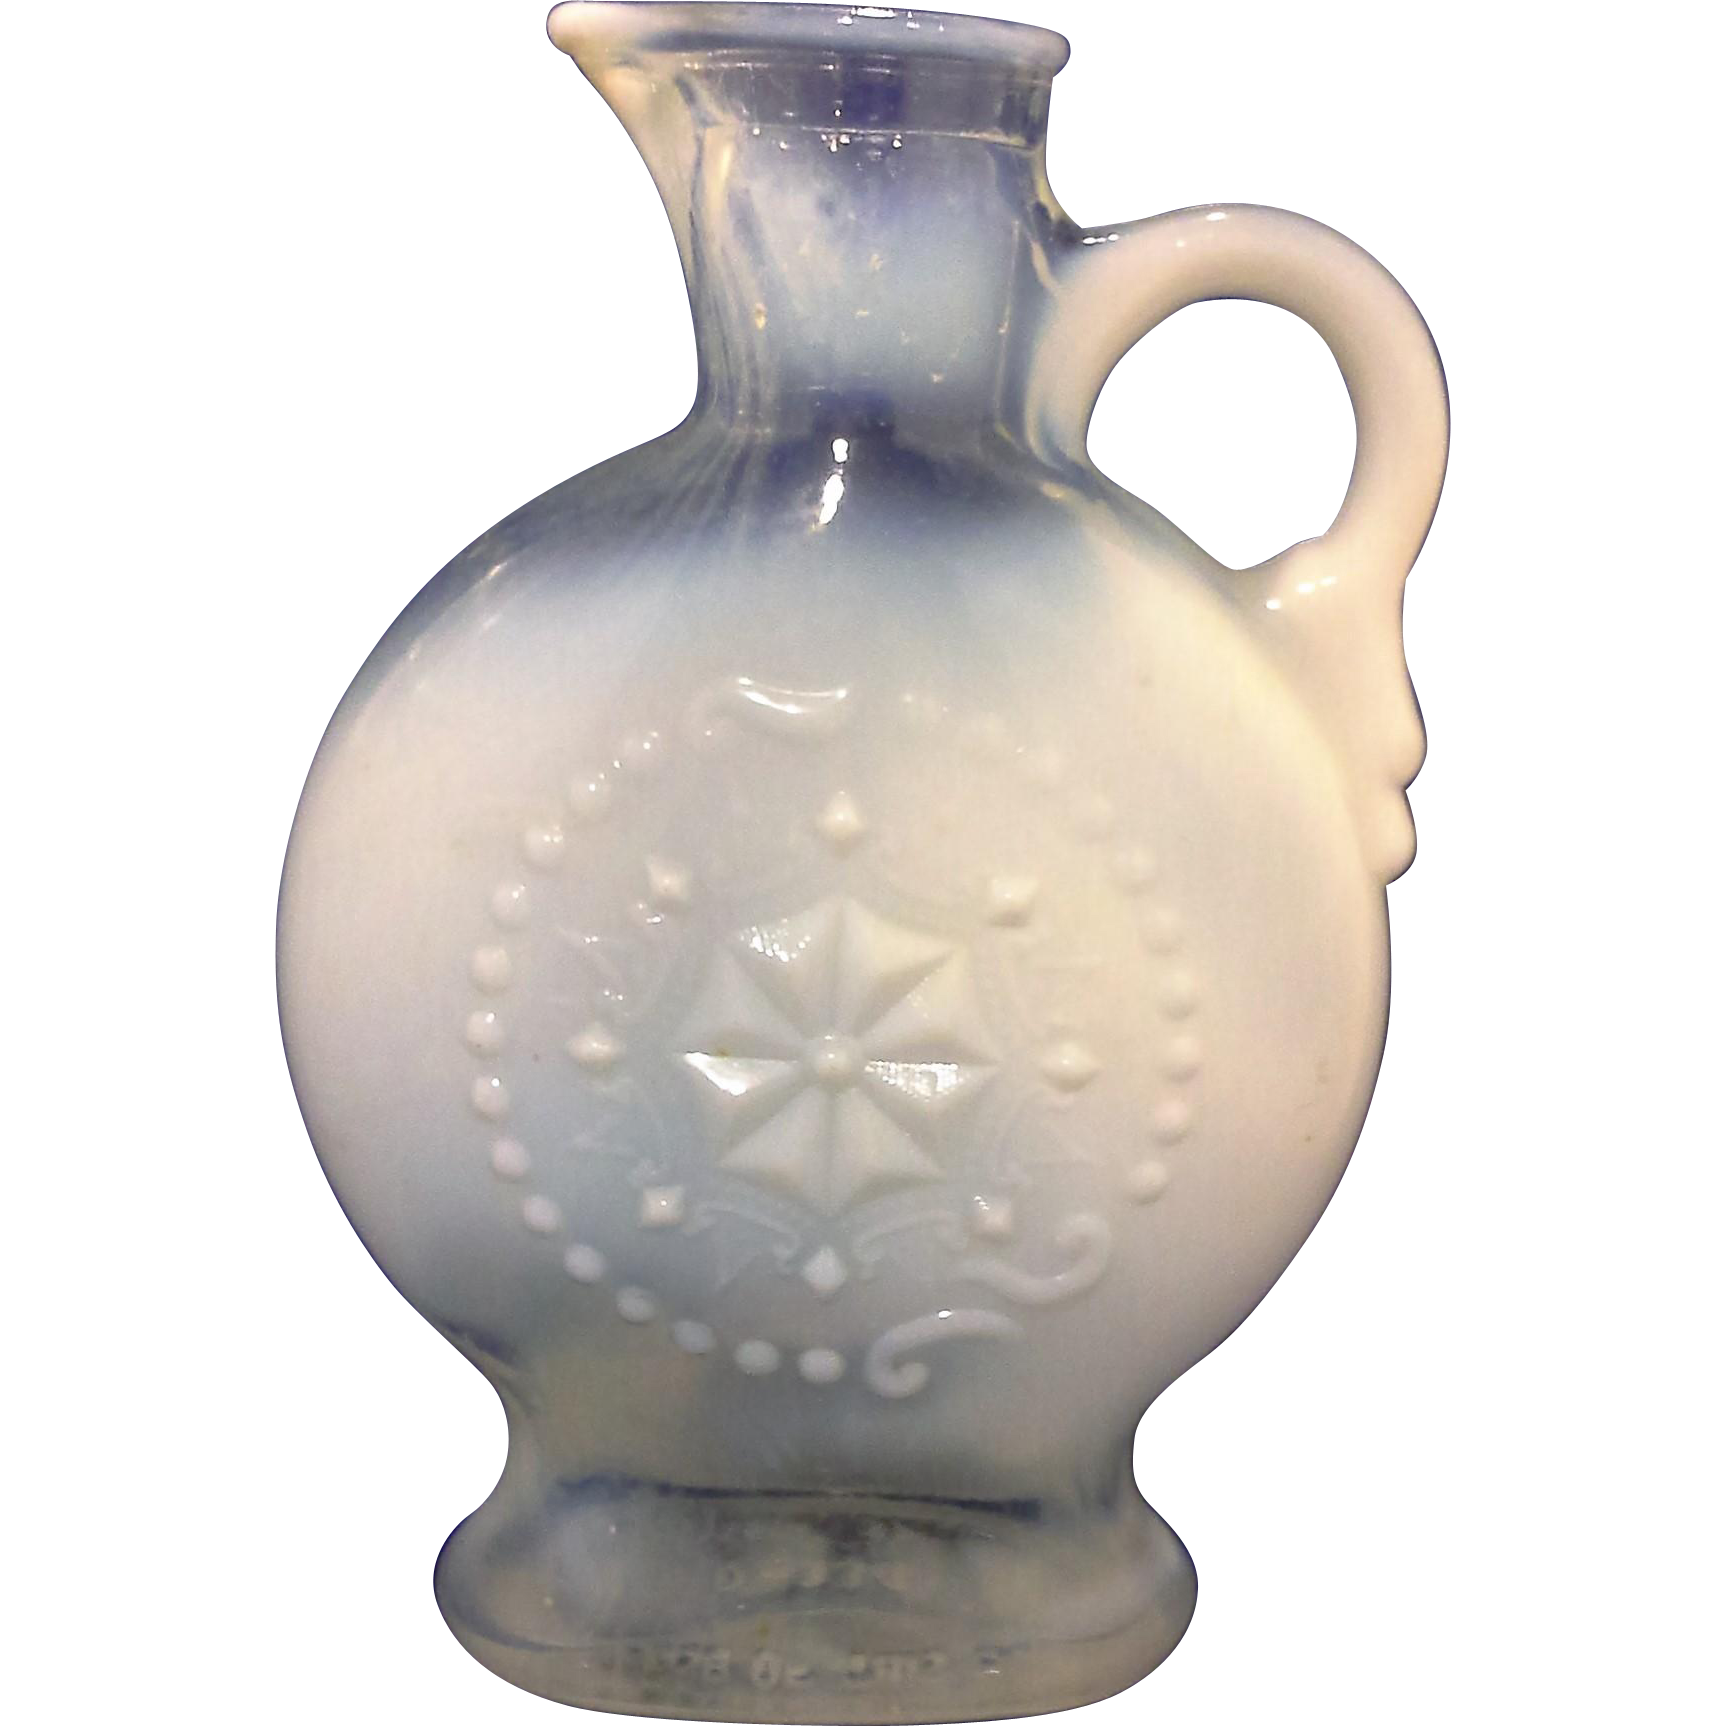 Jim Beam Royal Opalescent Clear White Glass Liquor Bottle Decanter Pressed Flower No Stopper 1957